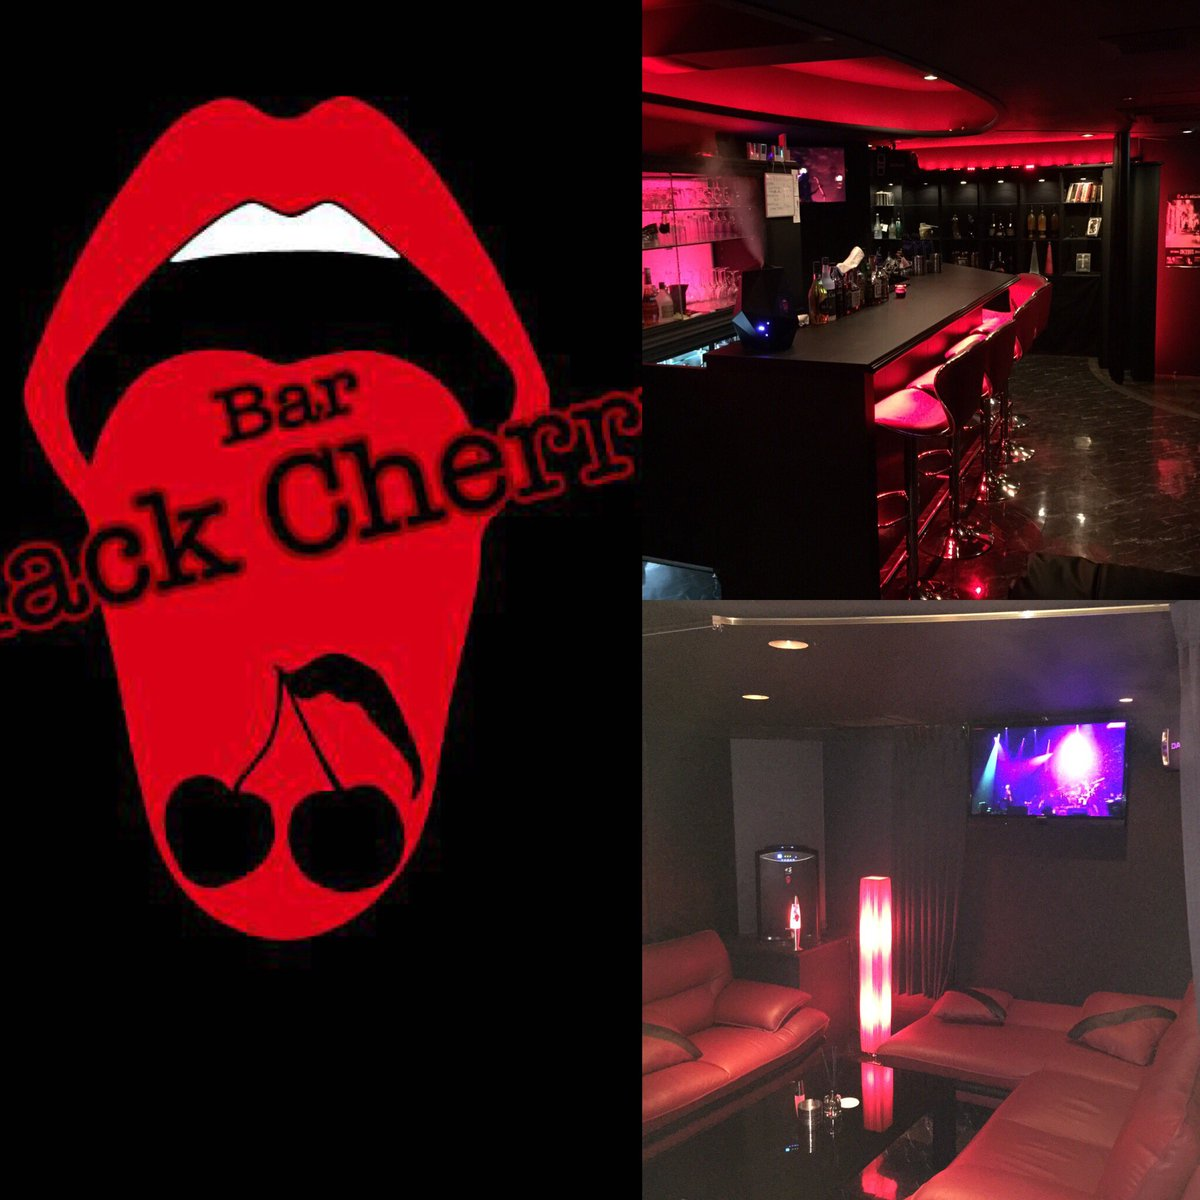 Bar Black Cherry A Twitter 10月7日土曜日は毎月恒例のabc Jdaオフ